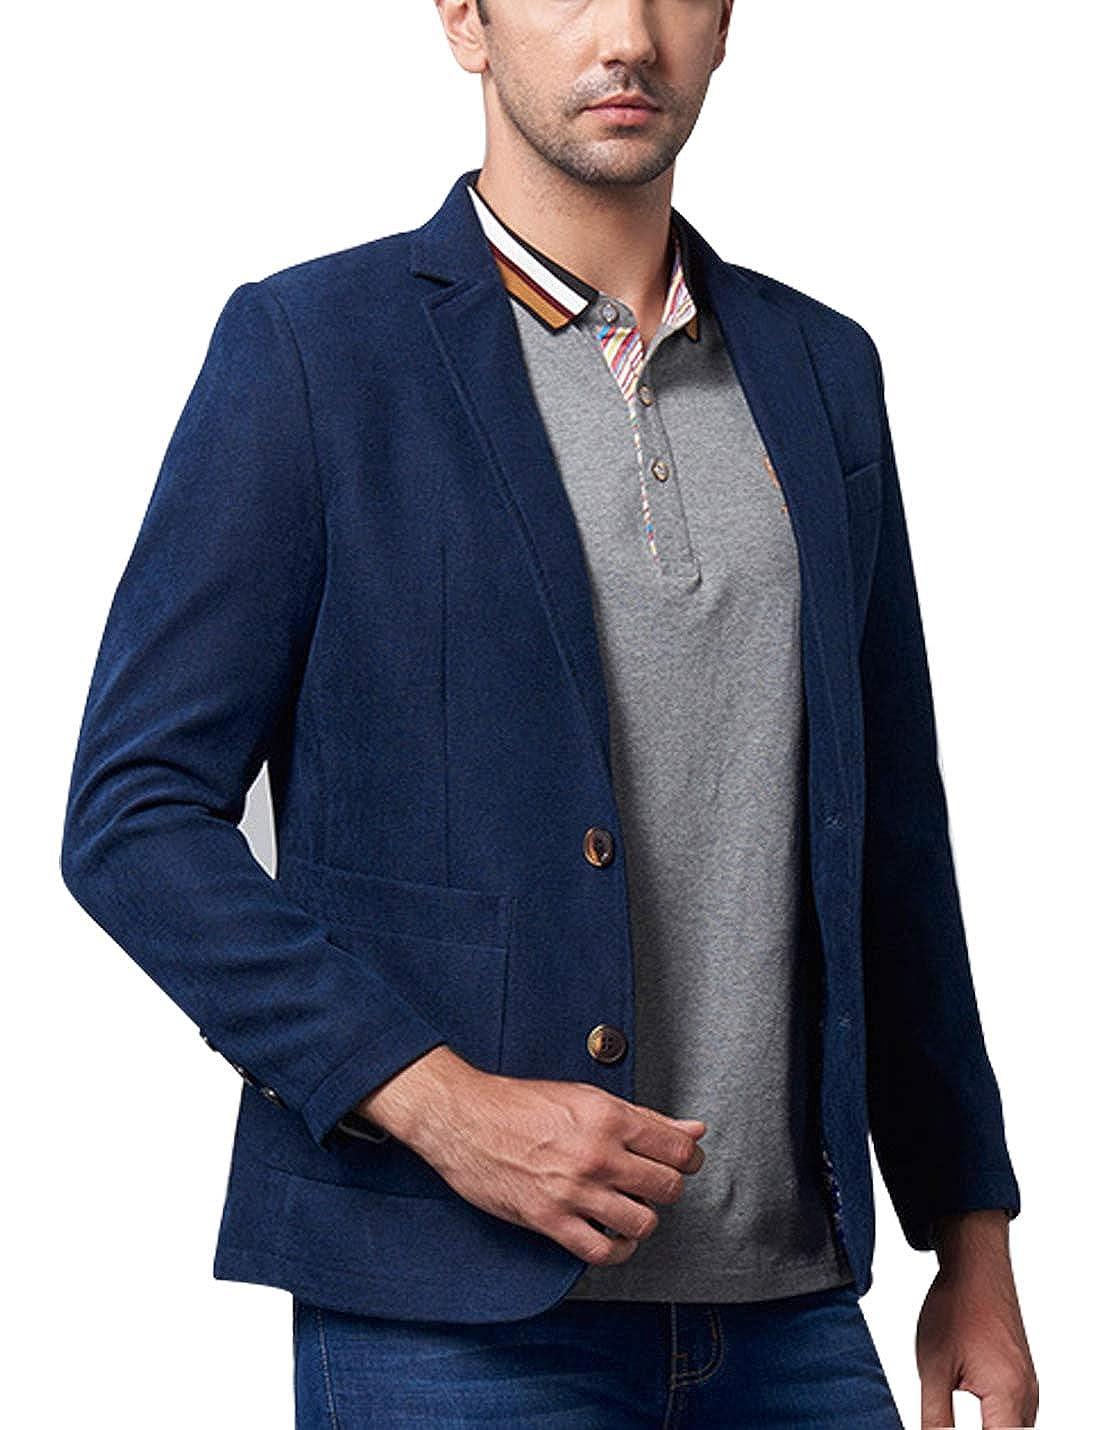 Omoone Mens Casual Lapel 2 Button Suits Slim Blazer Jacket Sports Coat